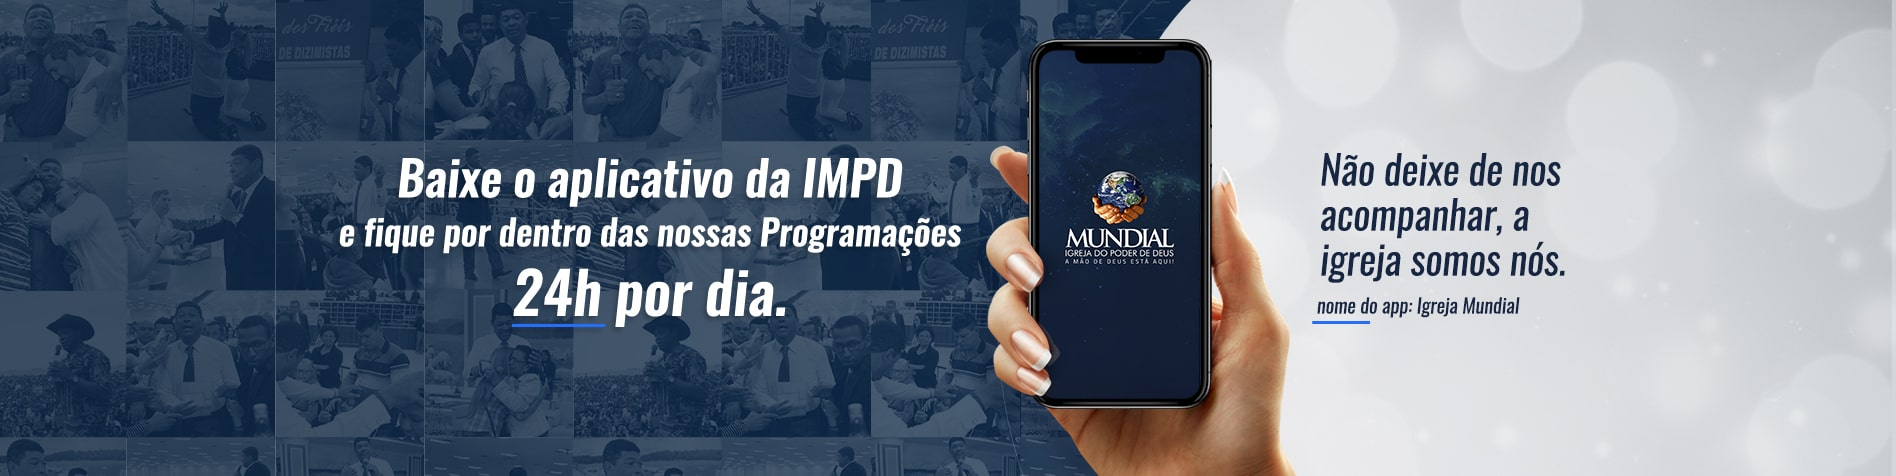 IMPD App